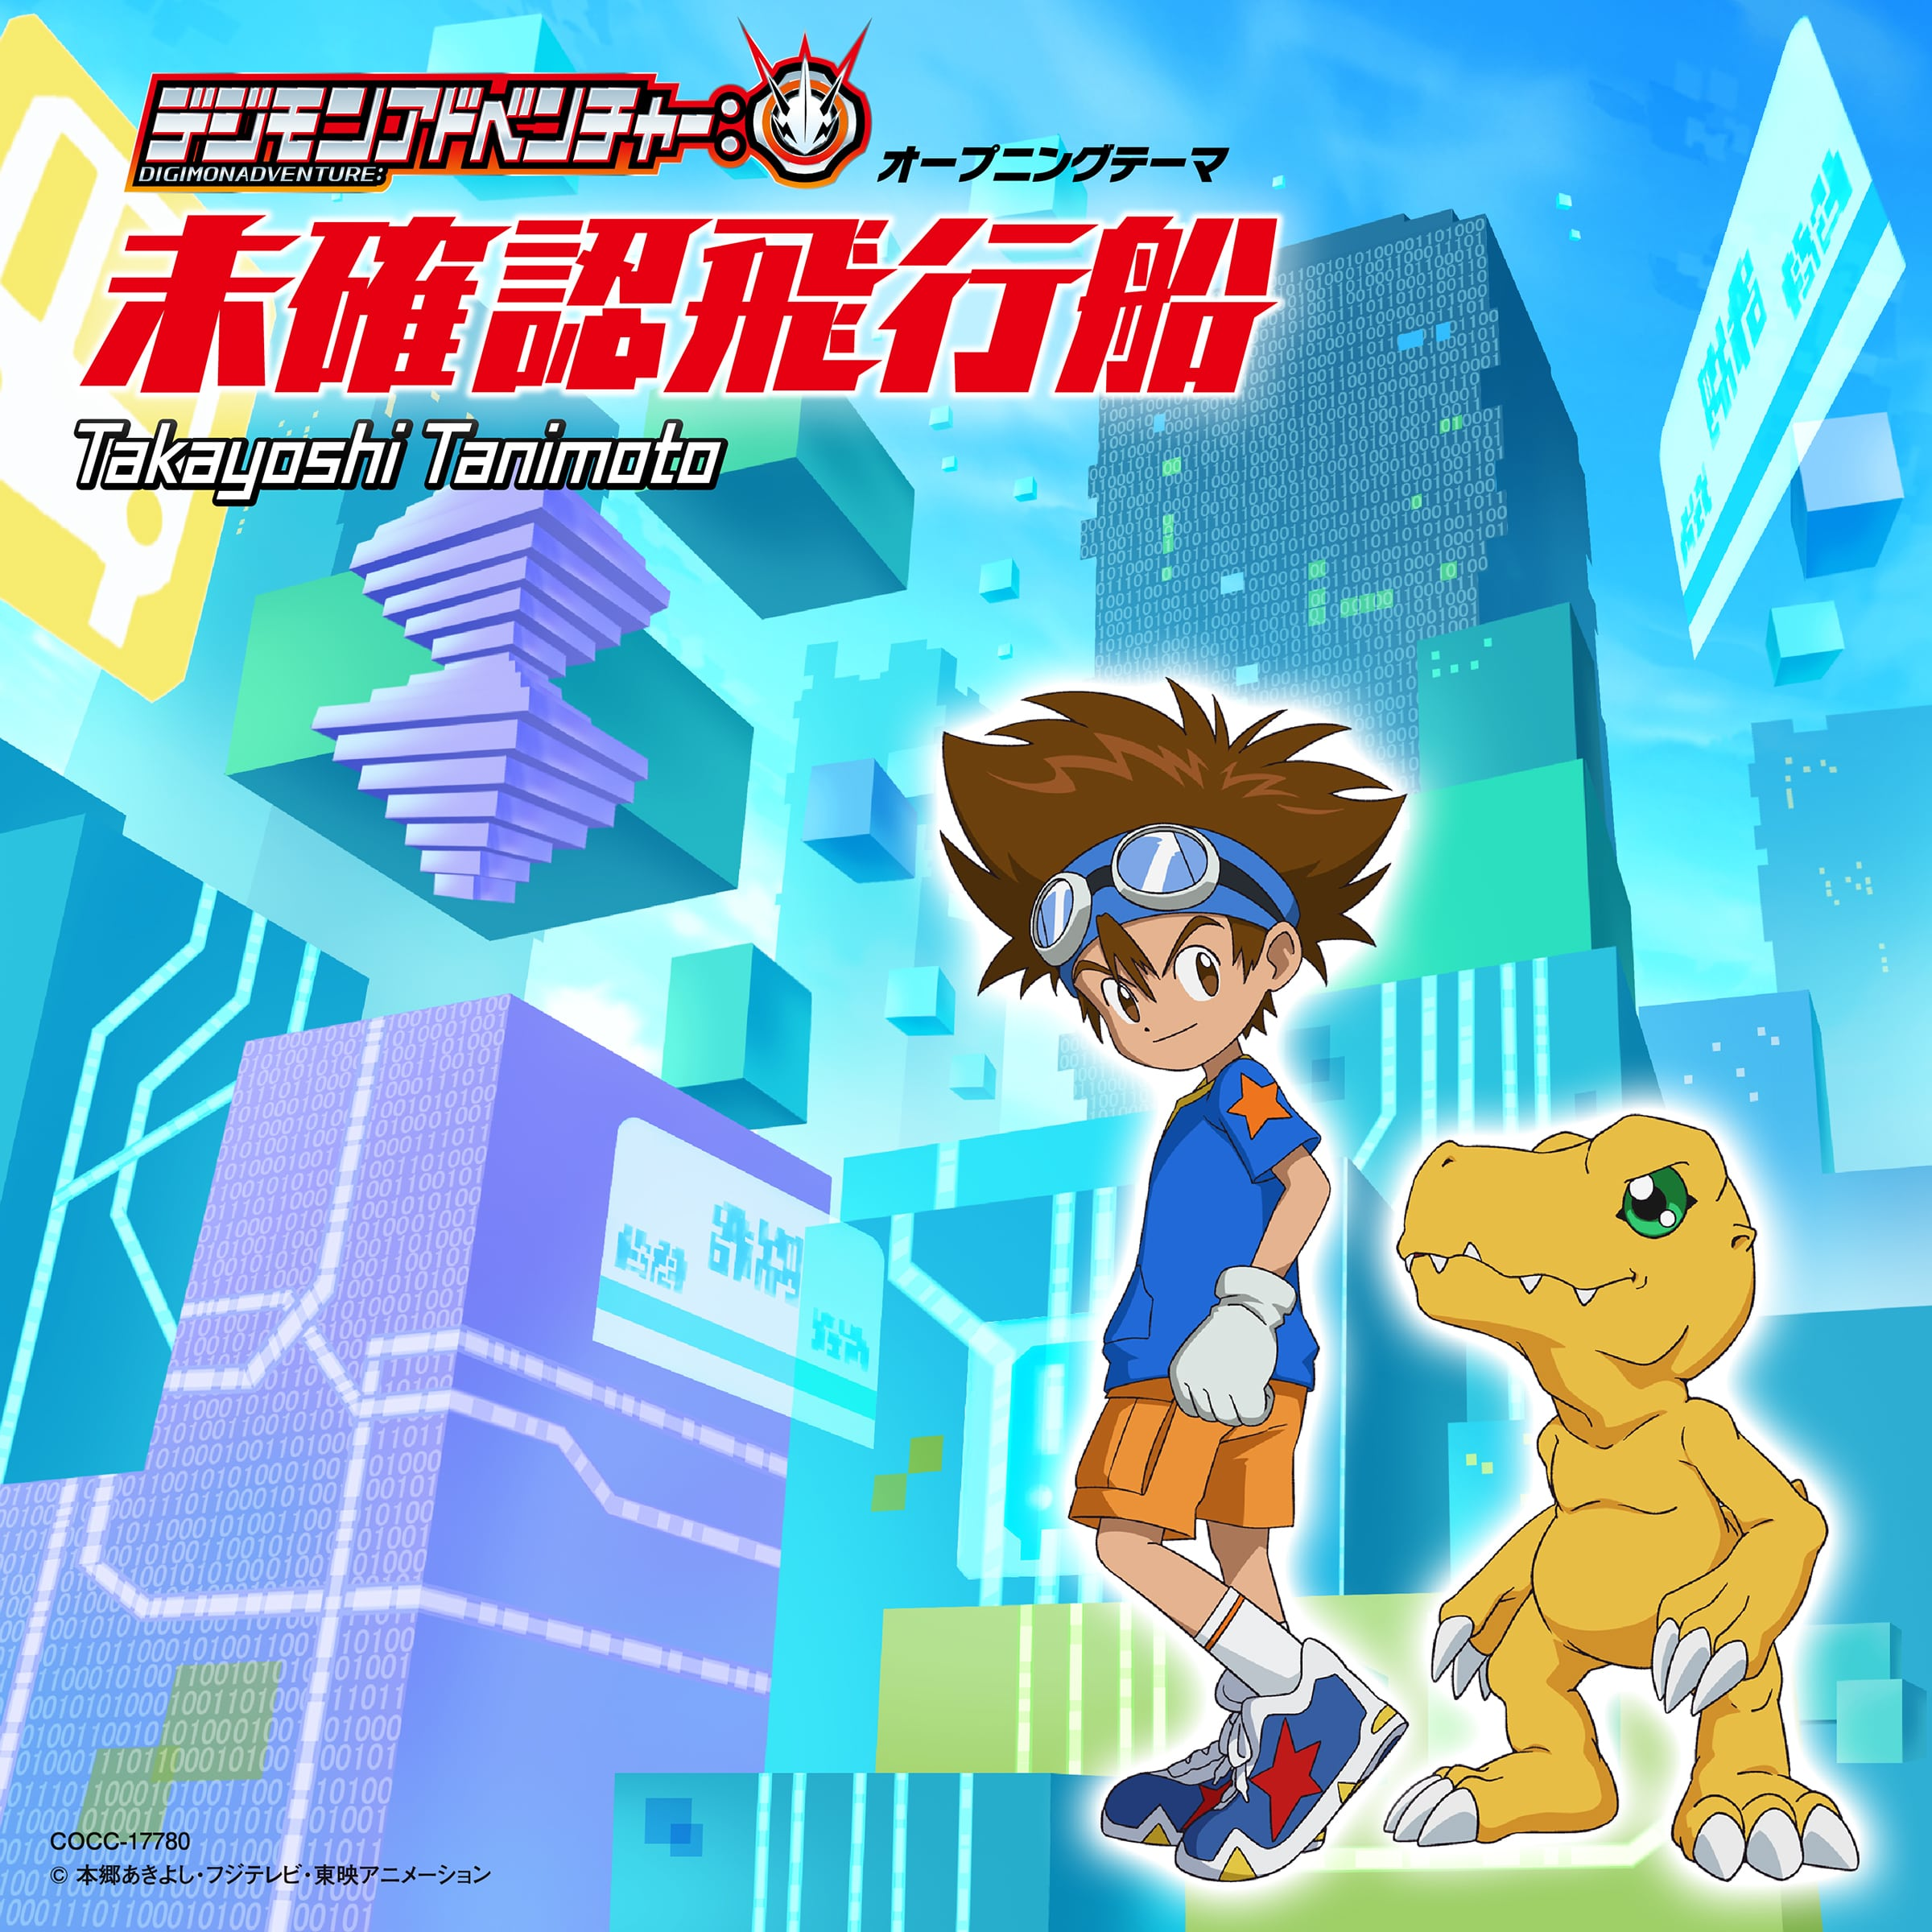 TVアニメ『デジモンアドベンチャー:』 主題歌CD 収録内容が解禁! 収録楽曲3曲をダイジェスト試聴できる動画も公開に!